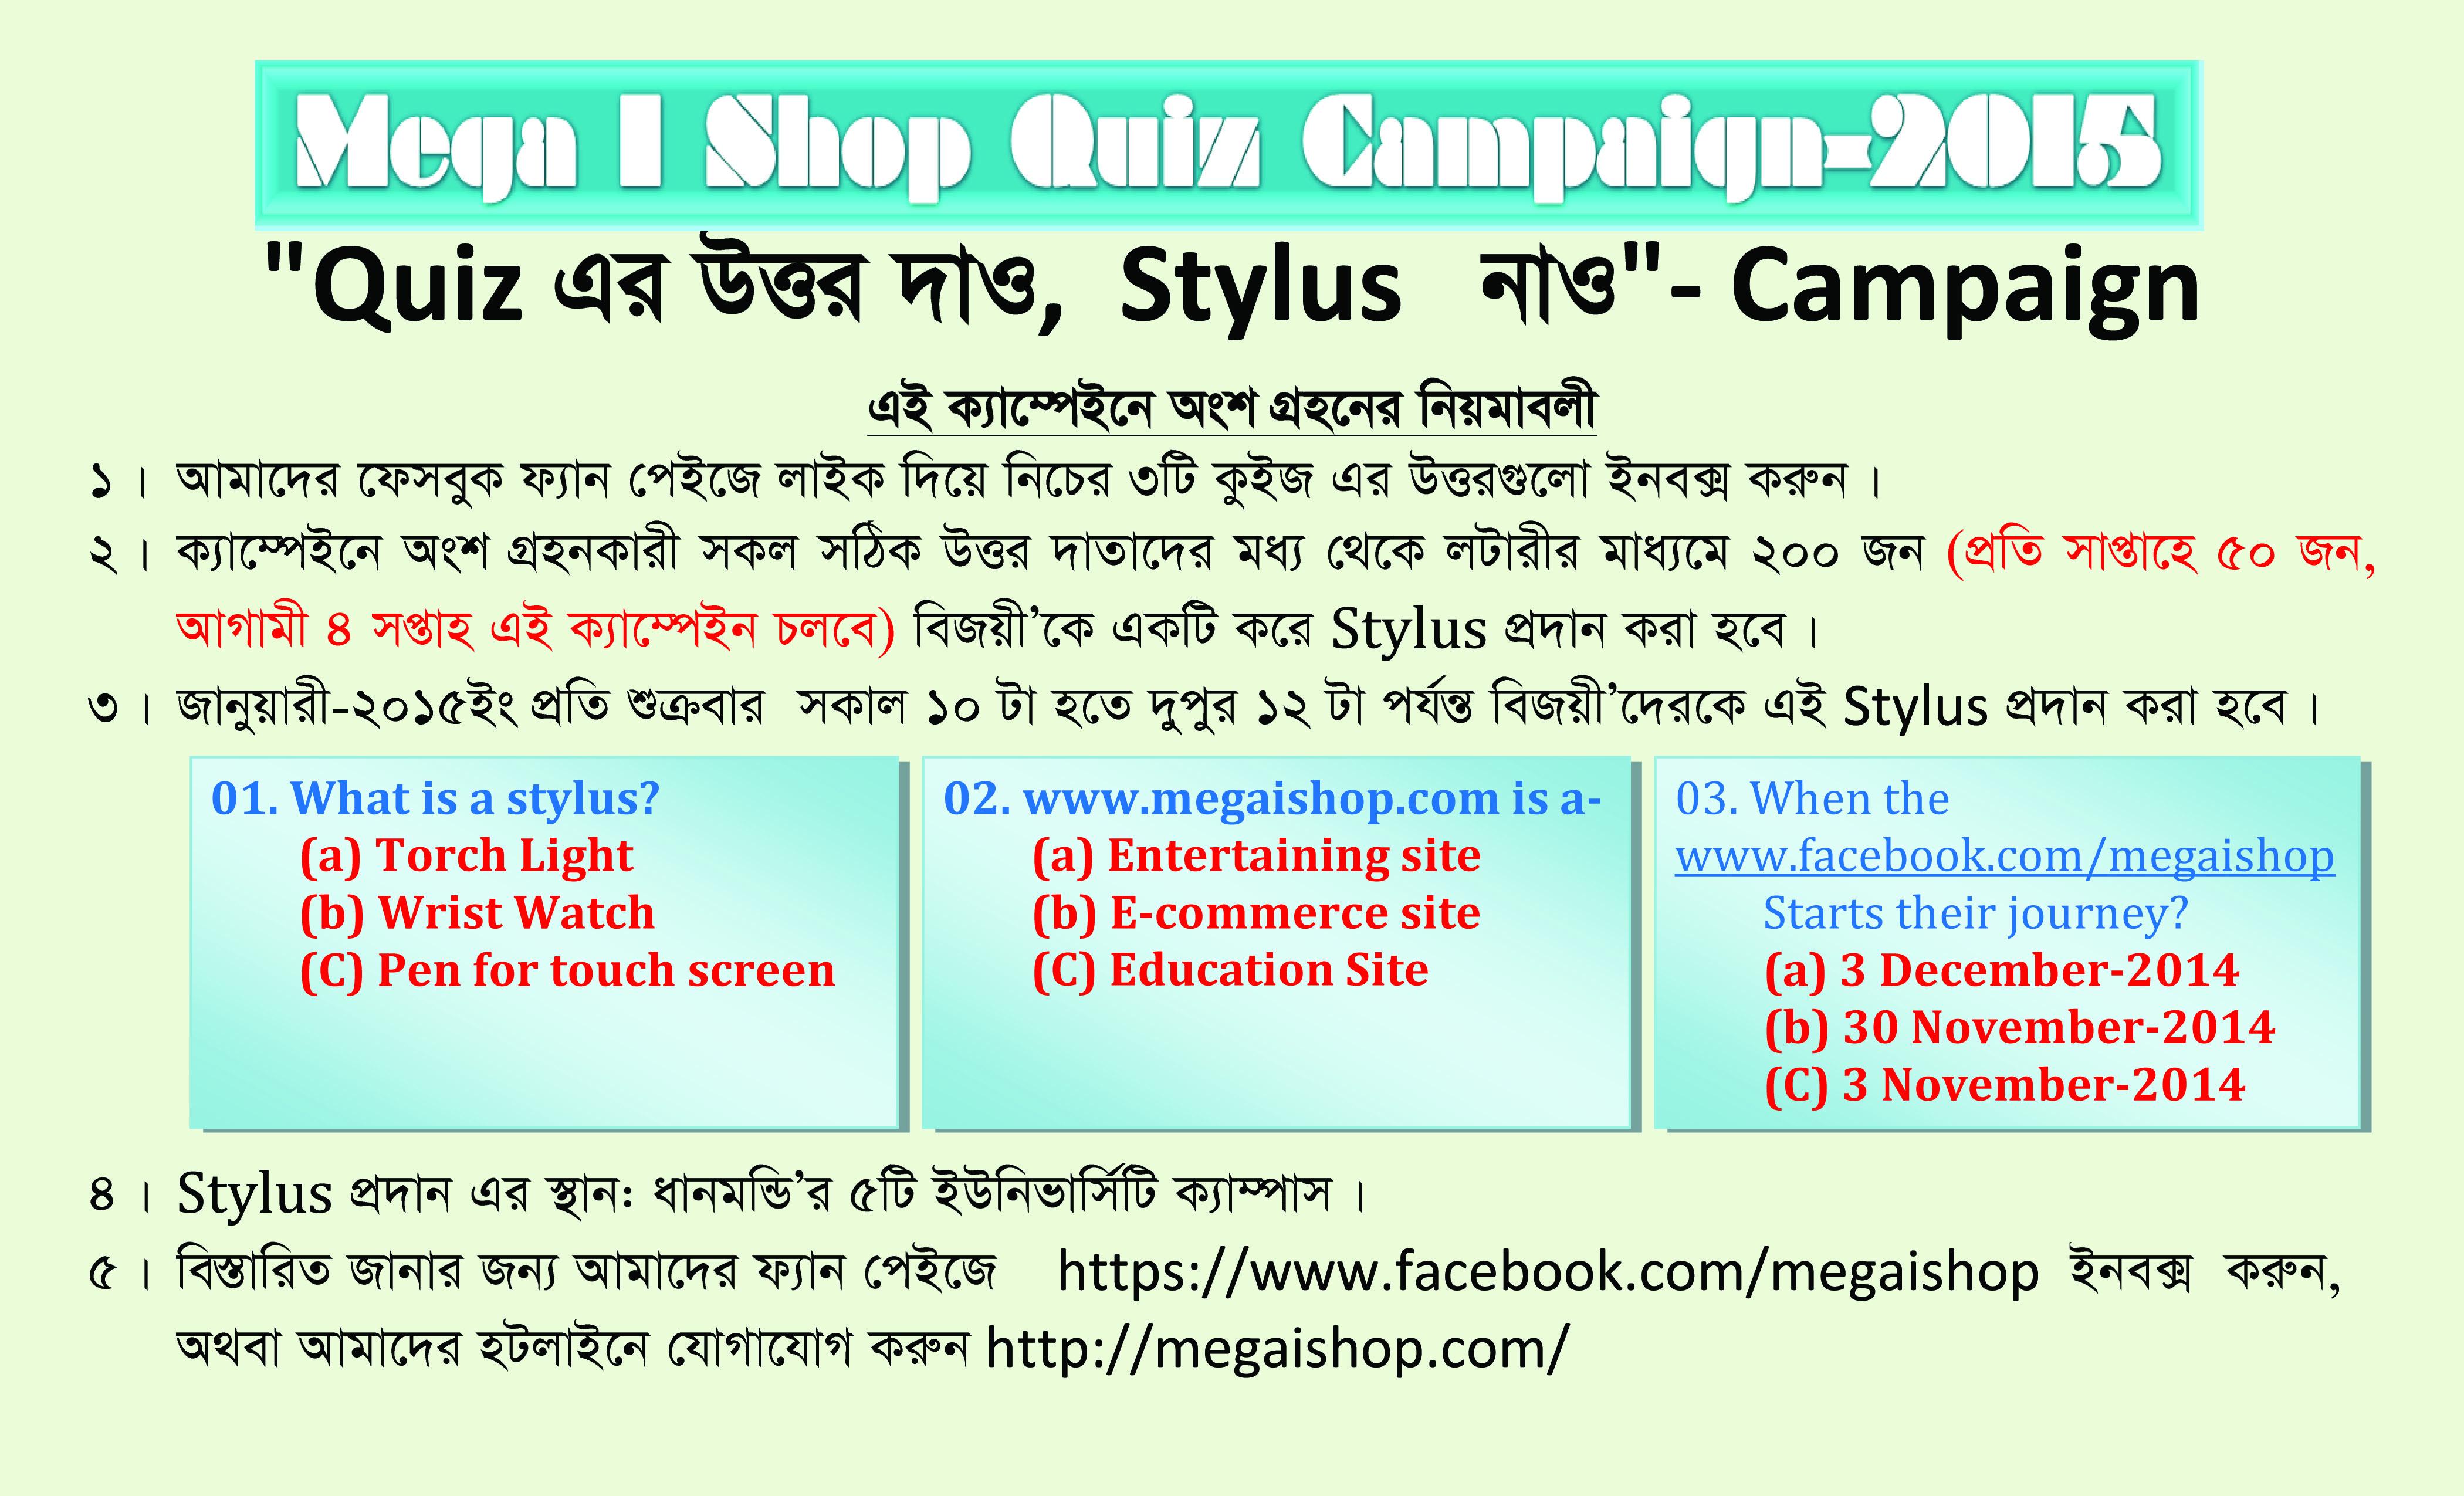 "Mega I Shop এর কুইজ Campaign-২০১৫, ""Quiz এর উত্তর দাও, Stylus নাও"" আপনিও অংশগ্রহণ করুন, আর জিতে নিন Stylus Pen"